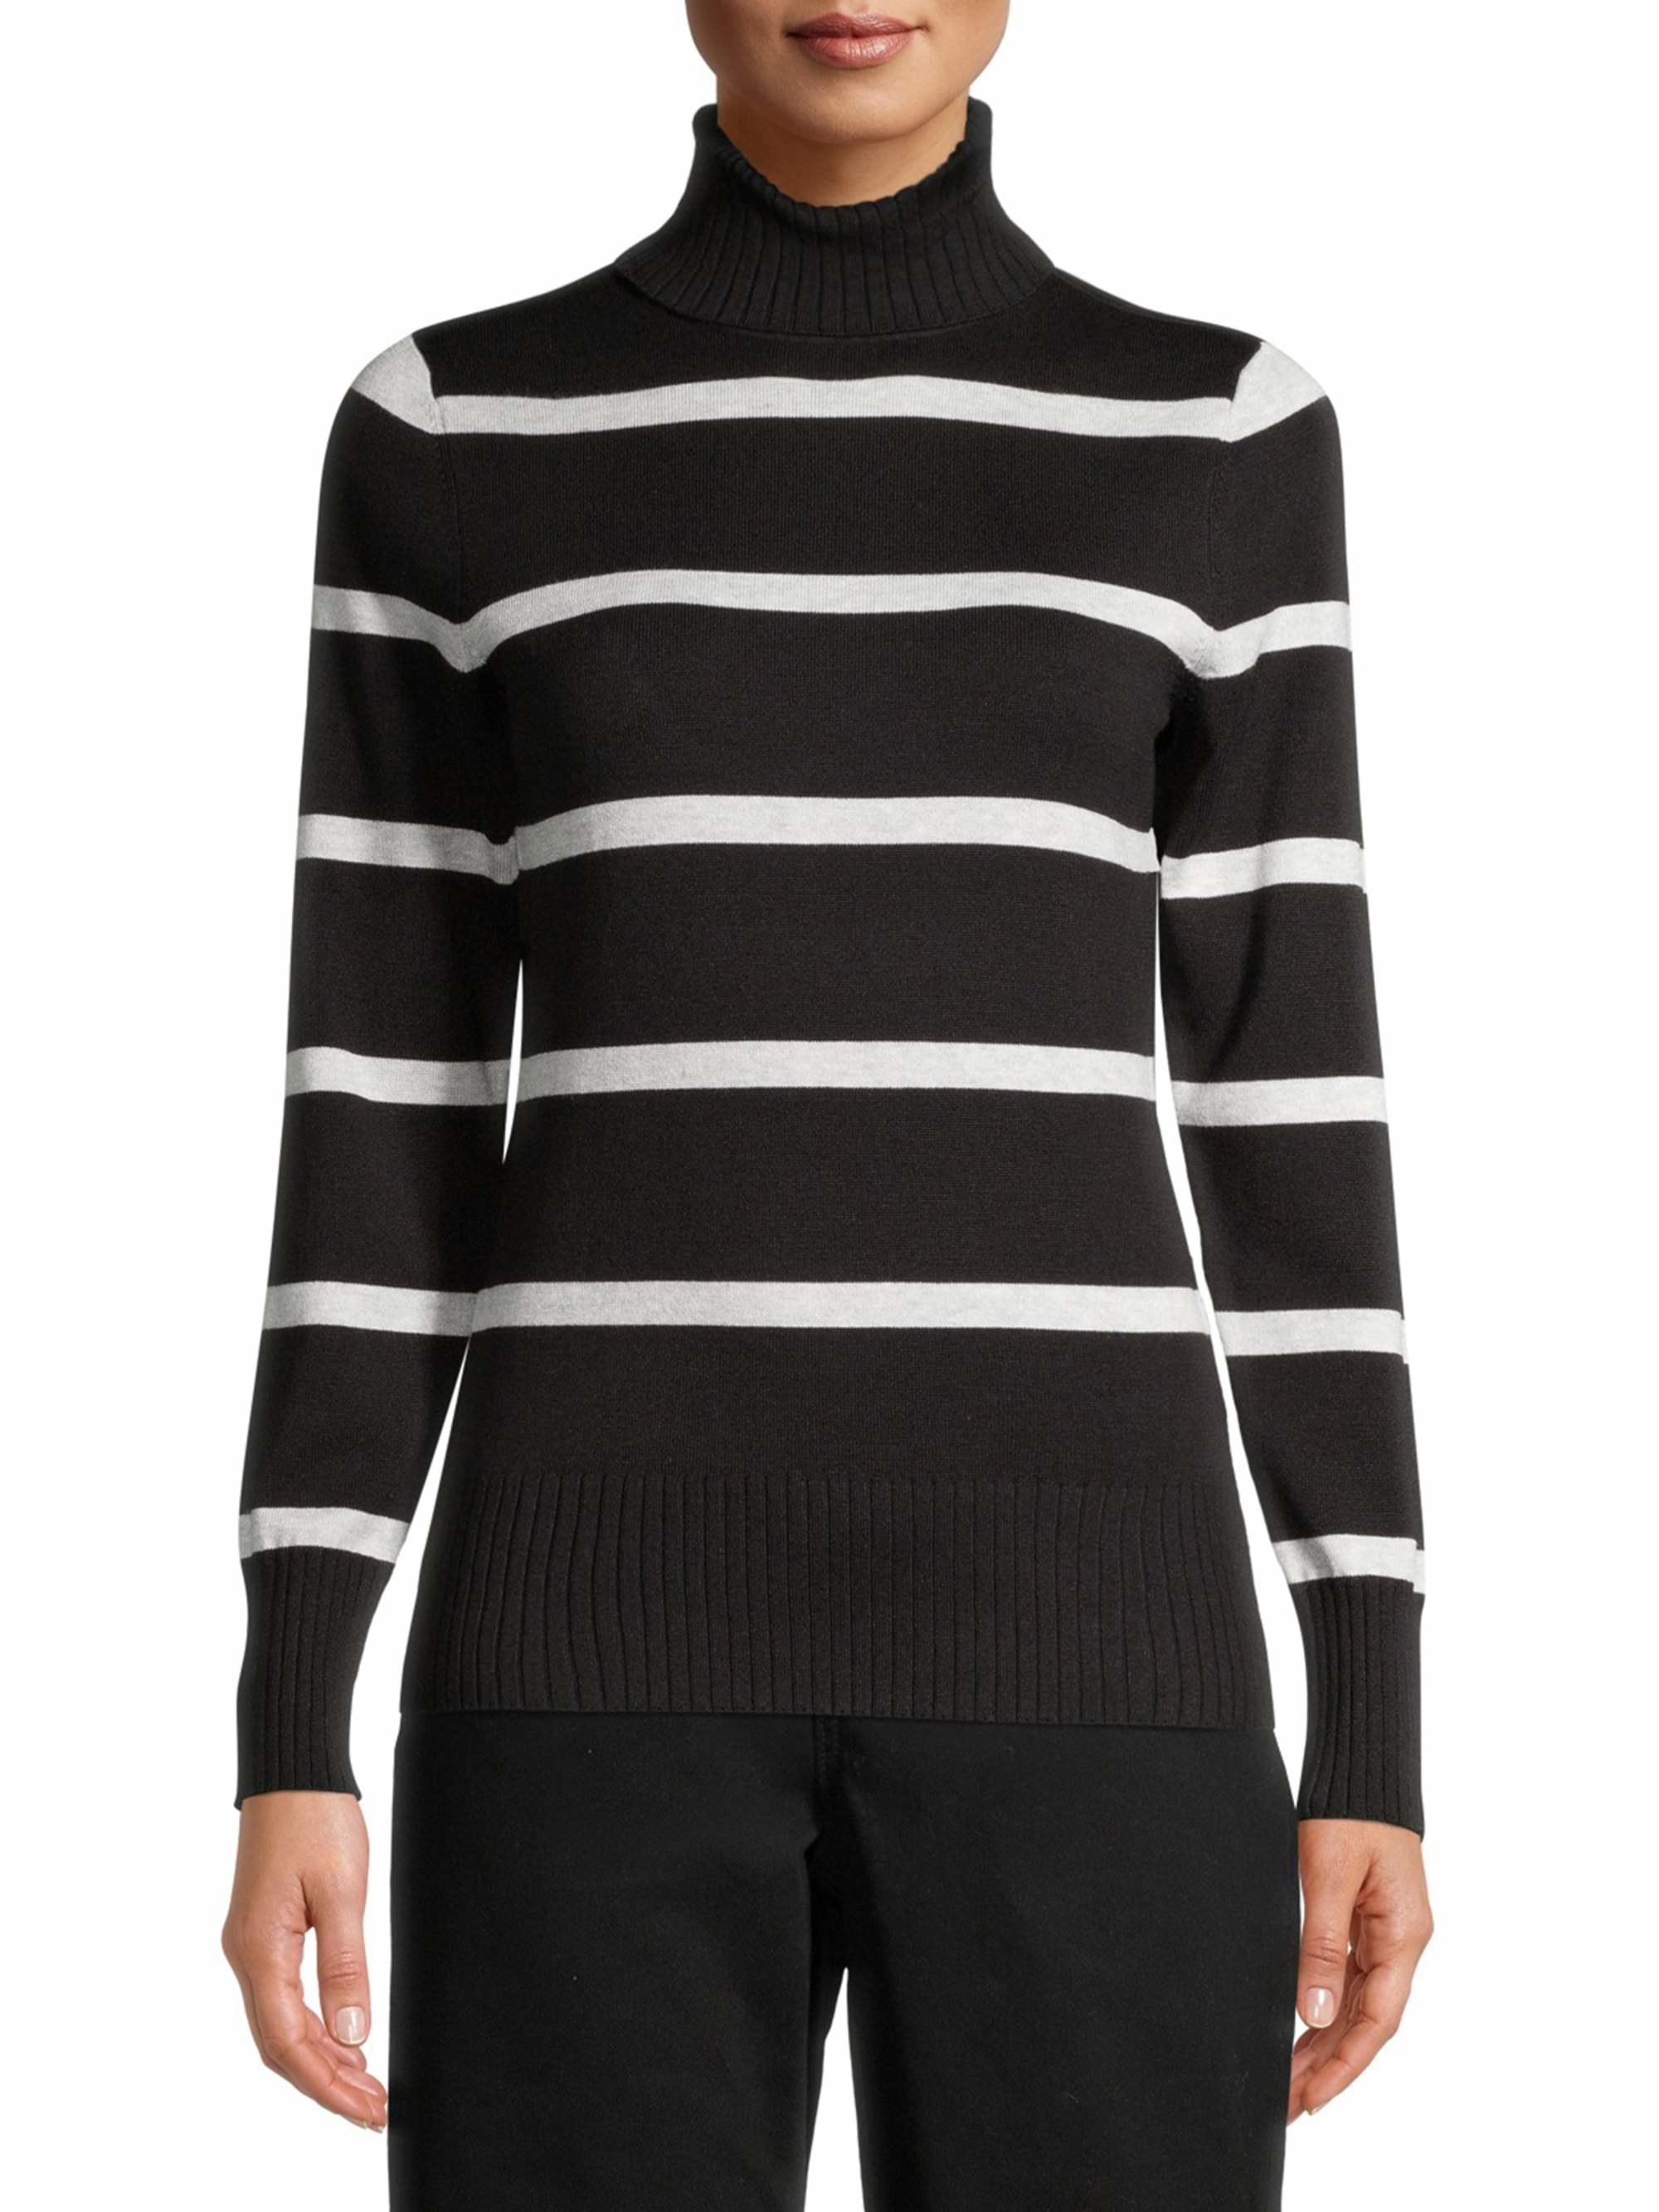 Model in a striped sweater